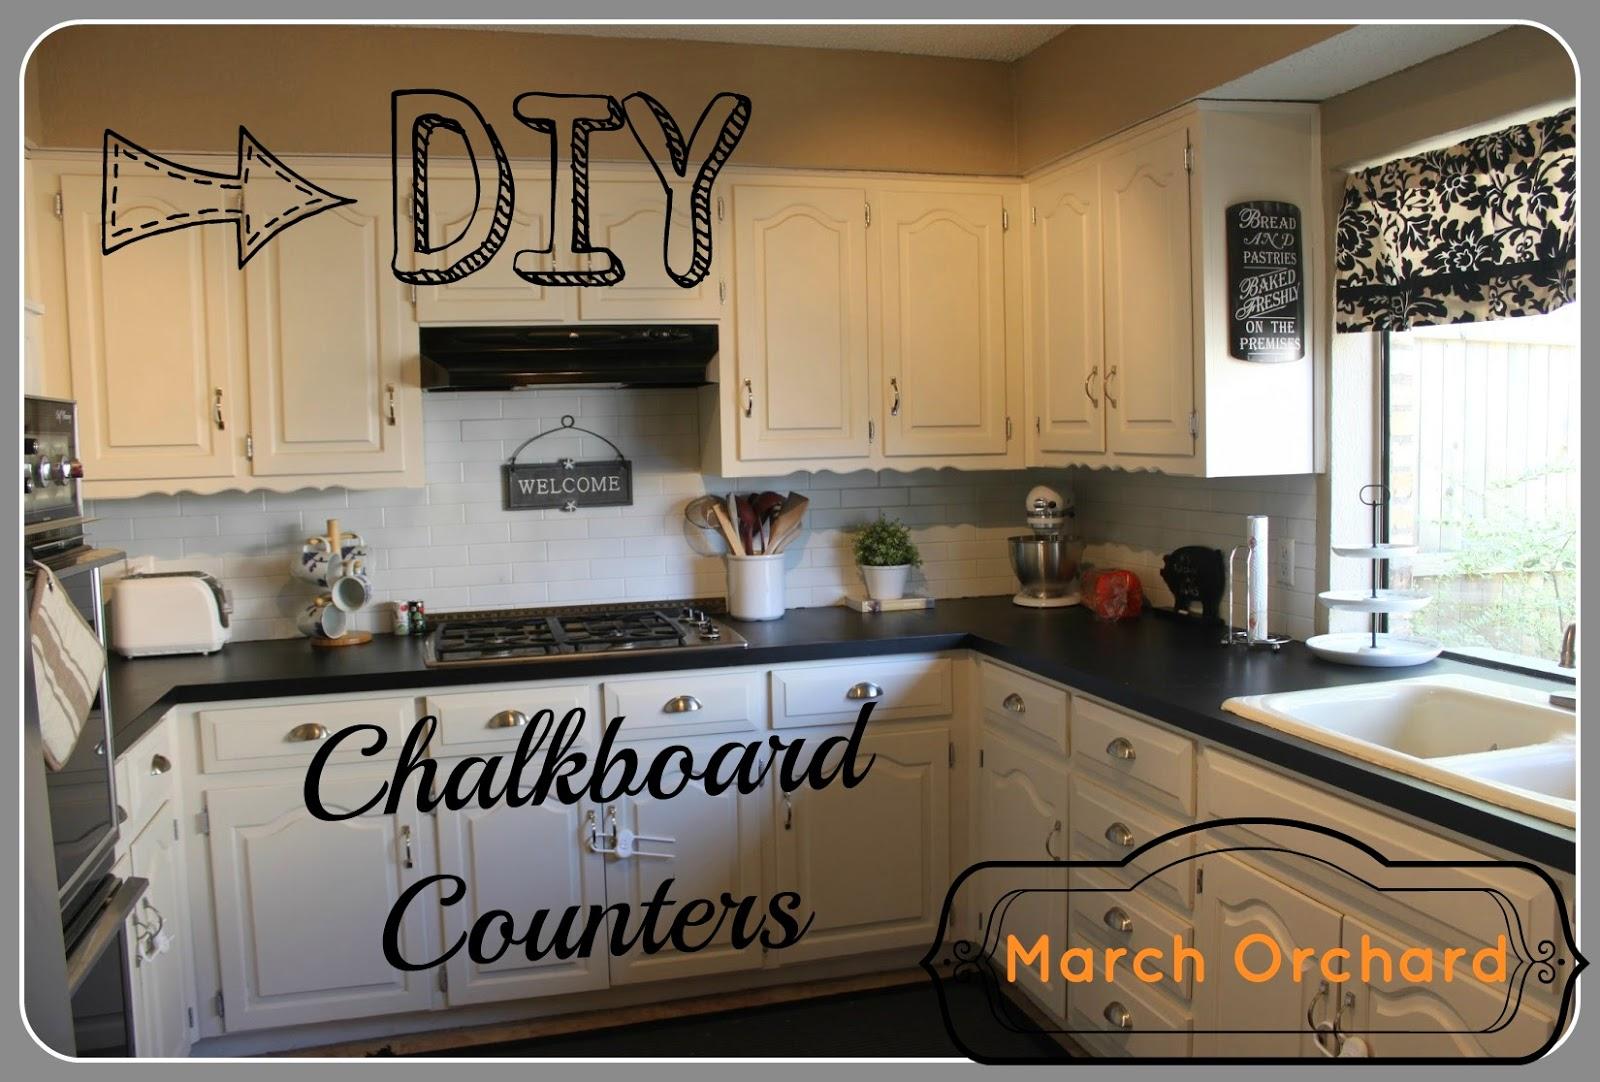 Chalkboard Counter Tops Soapstone Kitchen Countertops Chalkboard Countertops